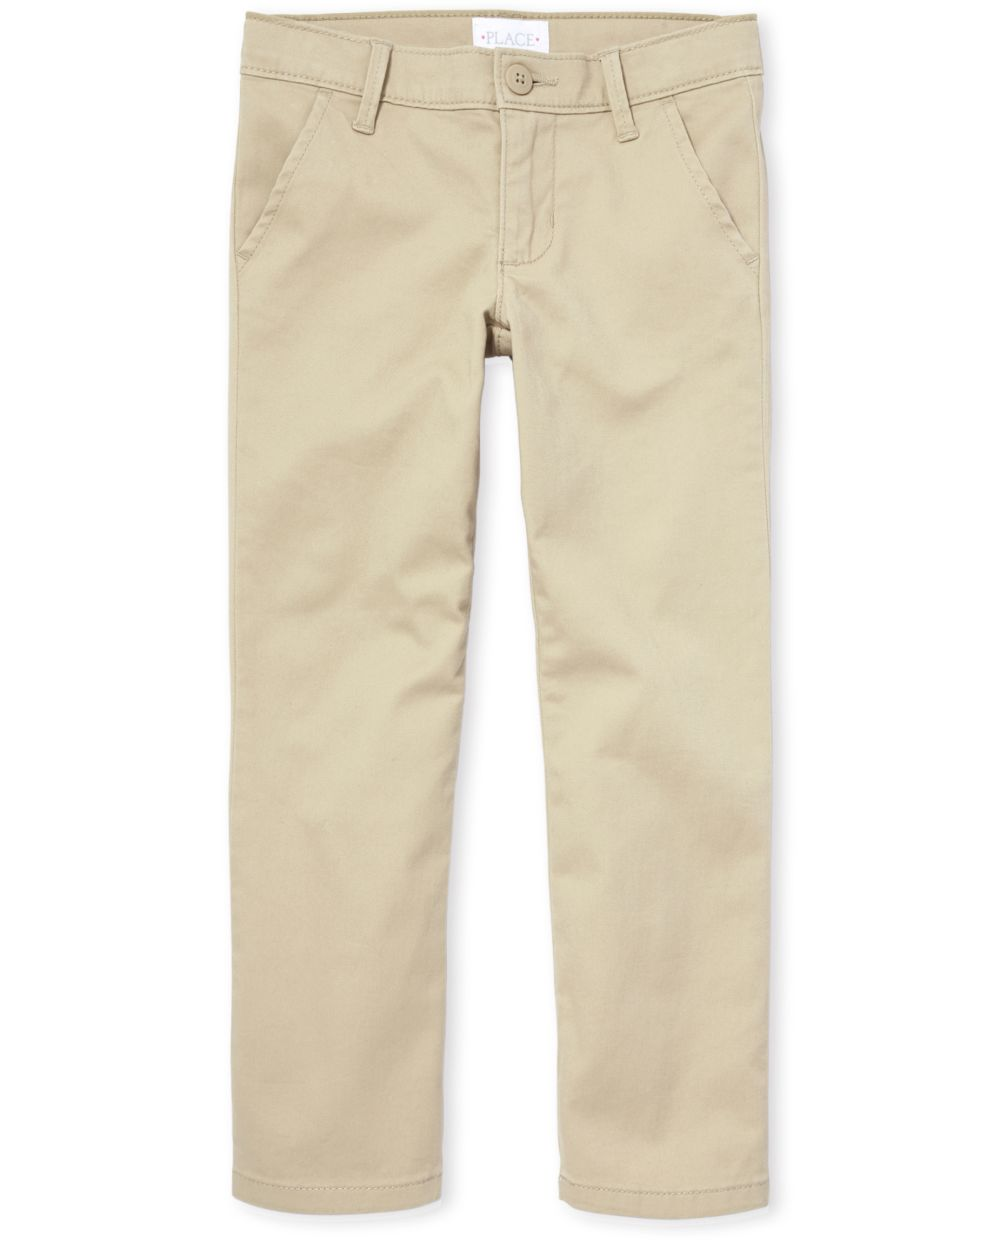 Girls Uniform Skinny Chino Pants